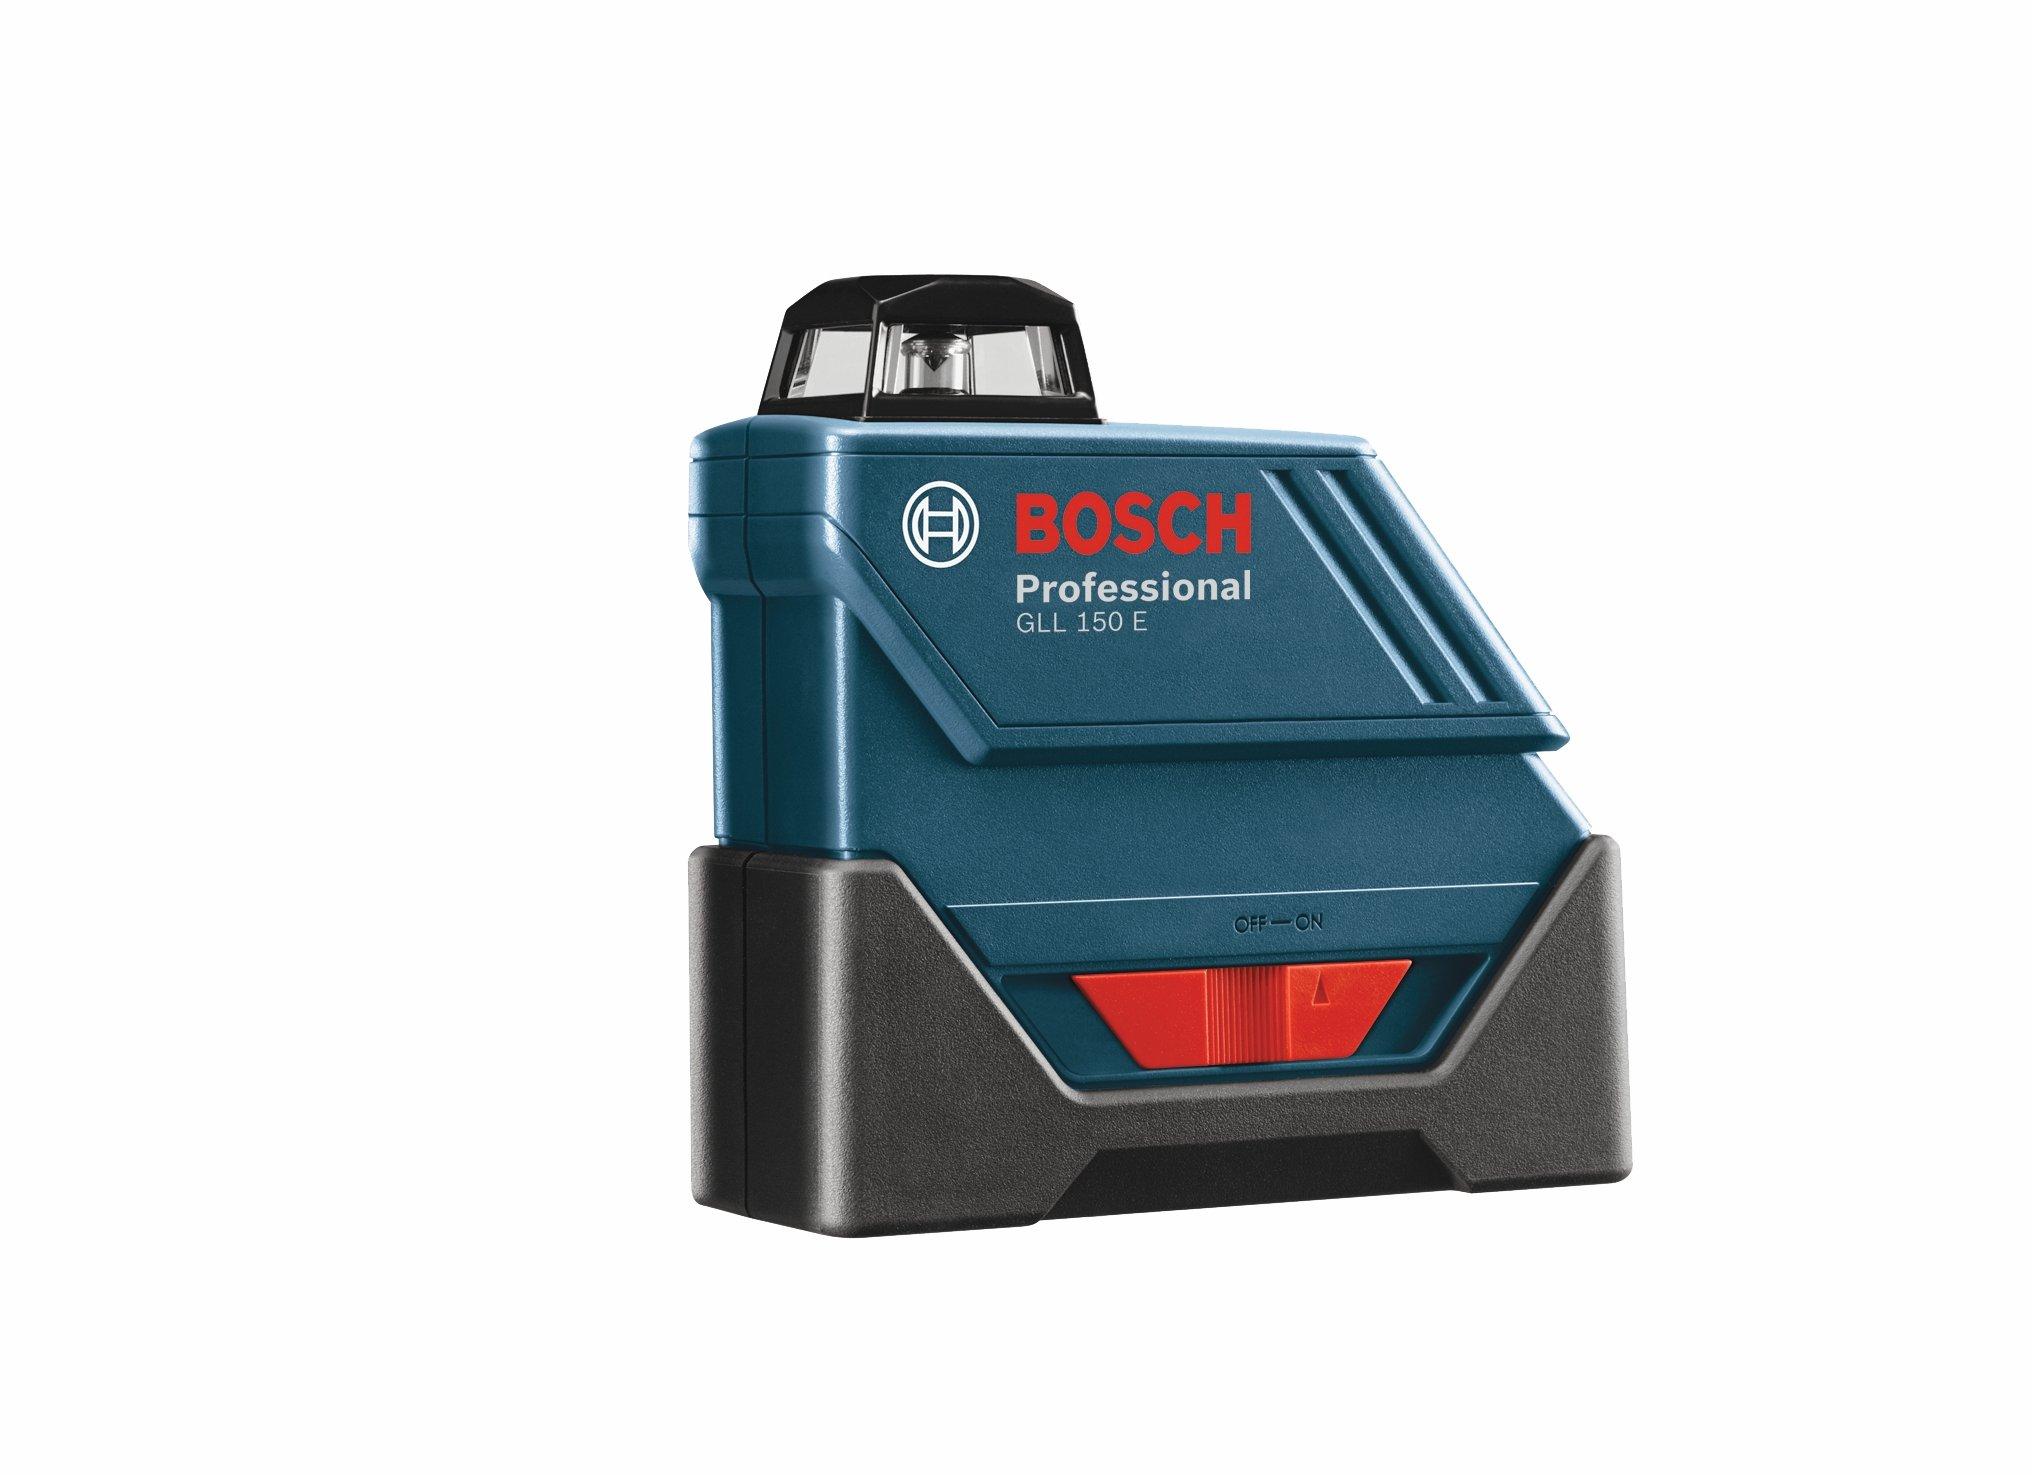 Bosch GLL 150 ECK 360-Degree Self-Leveling Exterior Laser Kit